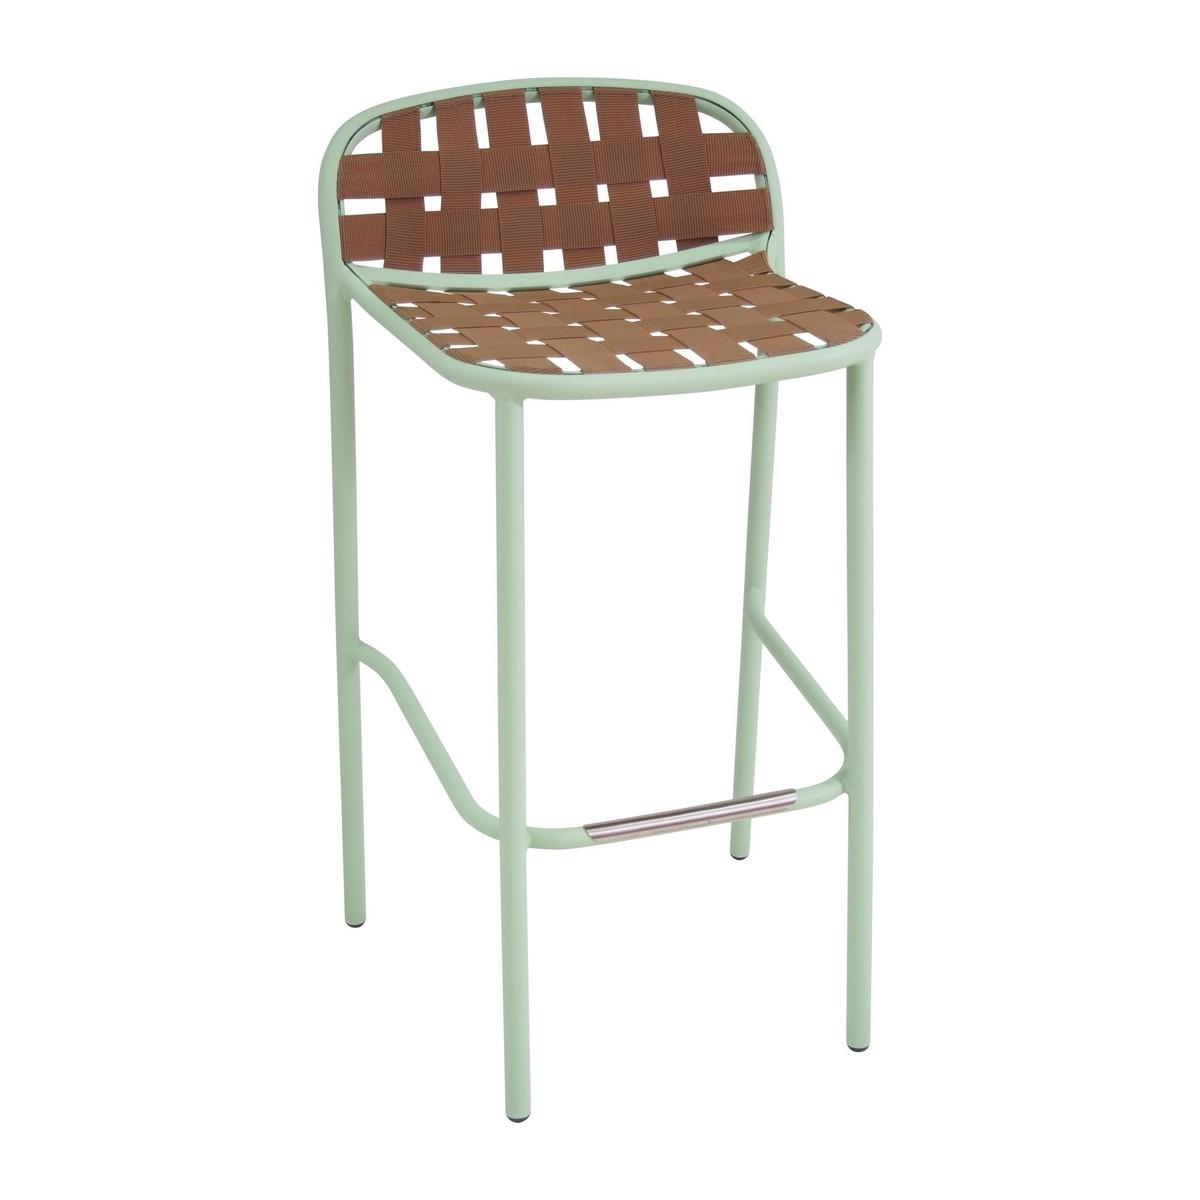 Emu   Yard Outdoor Bar Stool   Natural/frame Mint Green/LxWxH 50.5x50